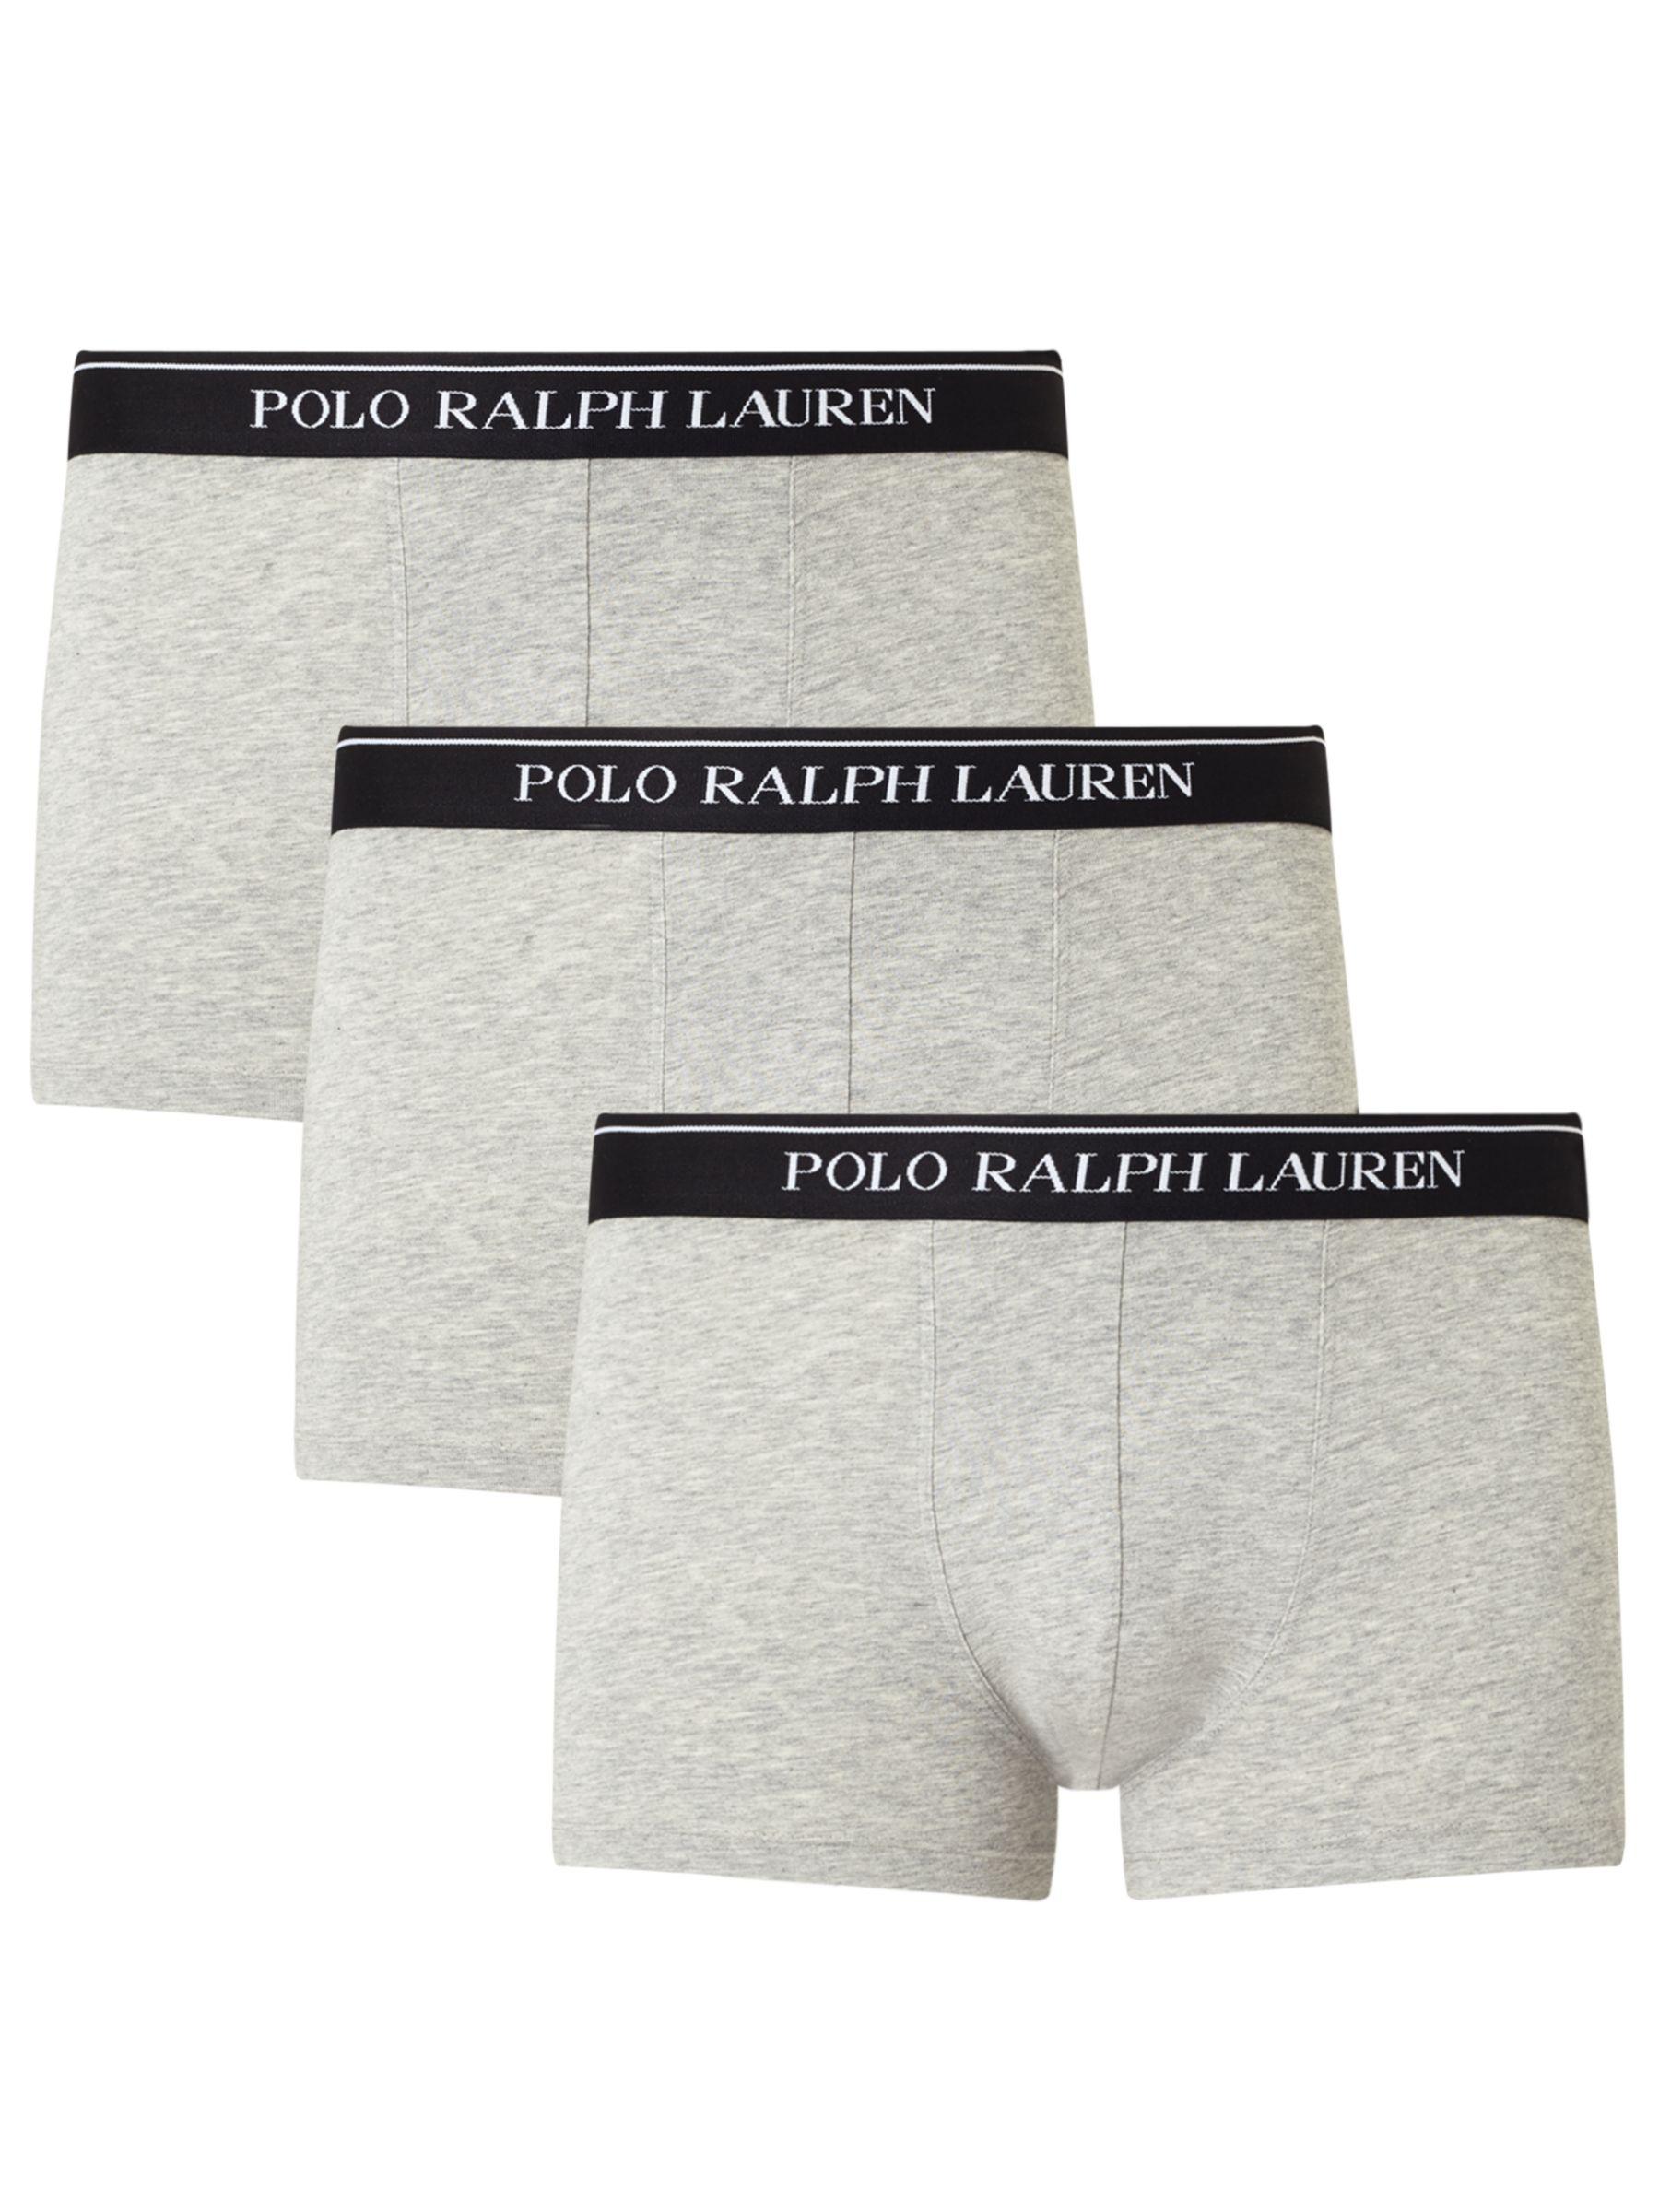 Ralph Lauren Polo Ralph Lauren Cotton Trunks, Pack of 3, Grey